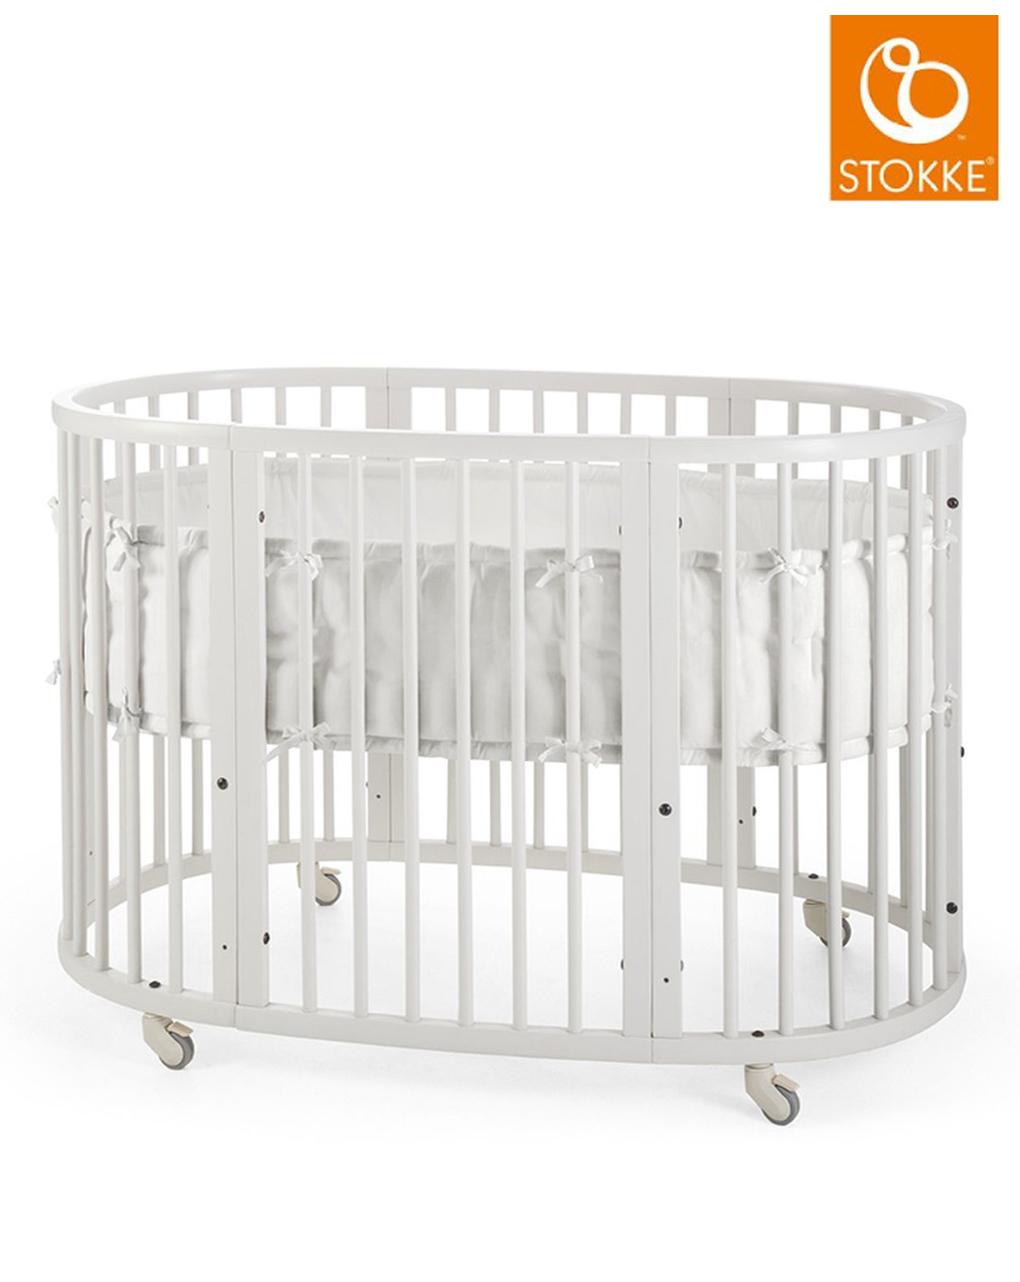 Stokke® sleepi™ paracolpi - white - Stokke